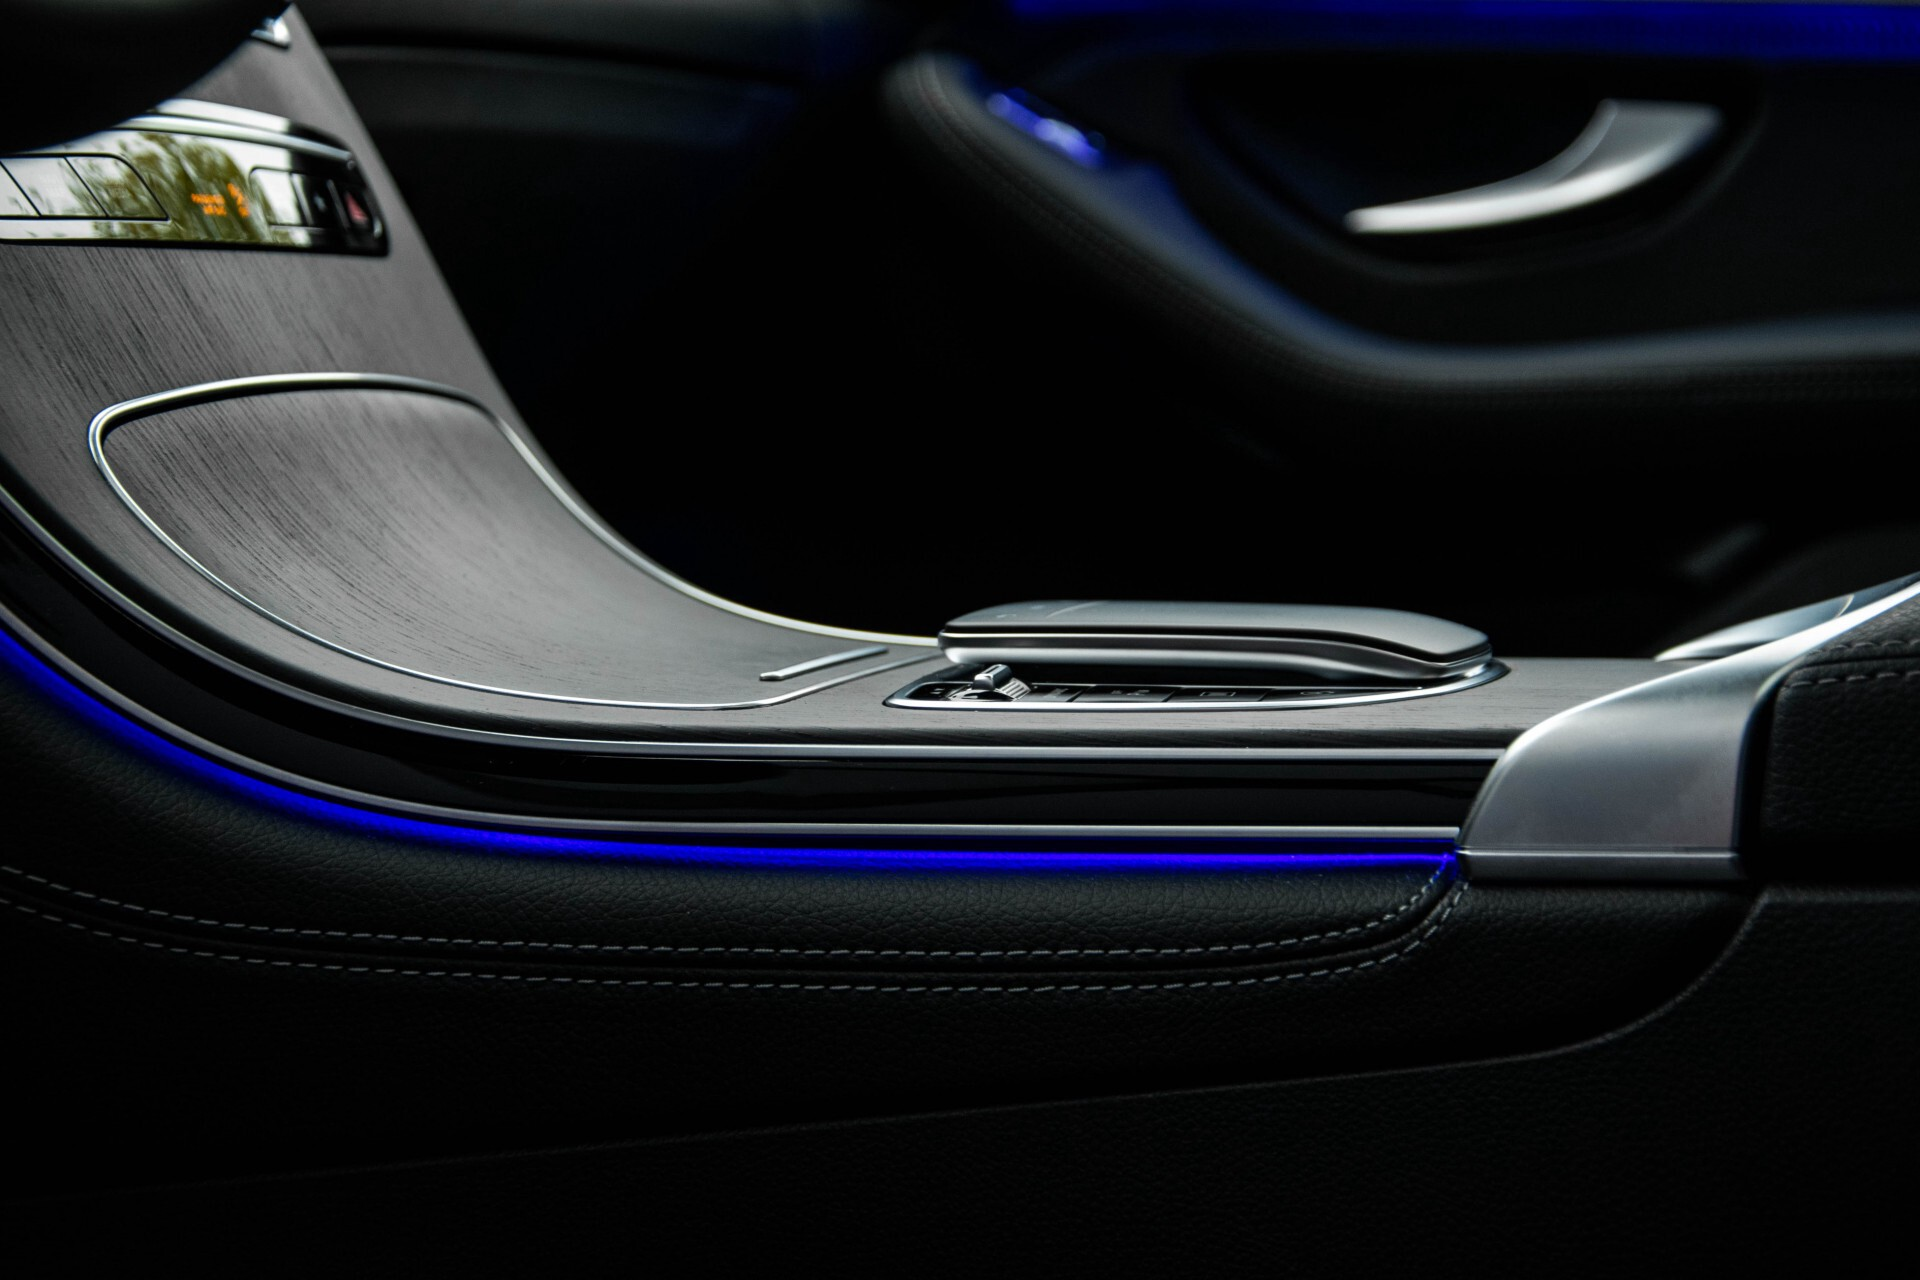 Mercedes-Benz GLC 200 4-M AMG Night/Panorama/Distronic Pro/Burmester/360camera/Exclusive Aut9 Foto 34